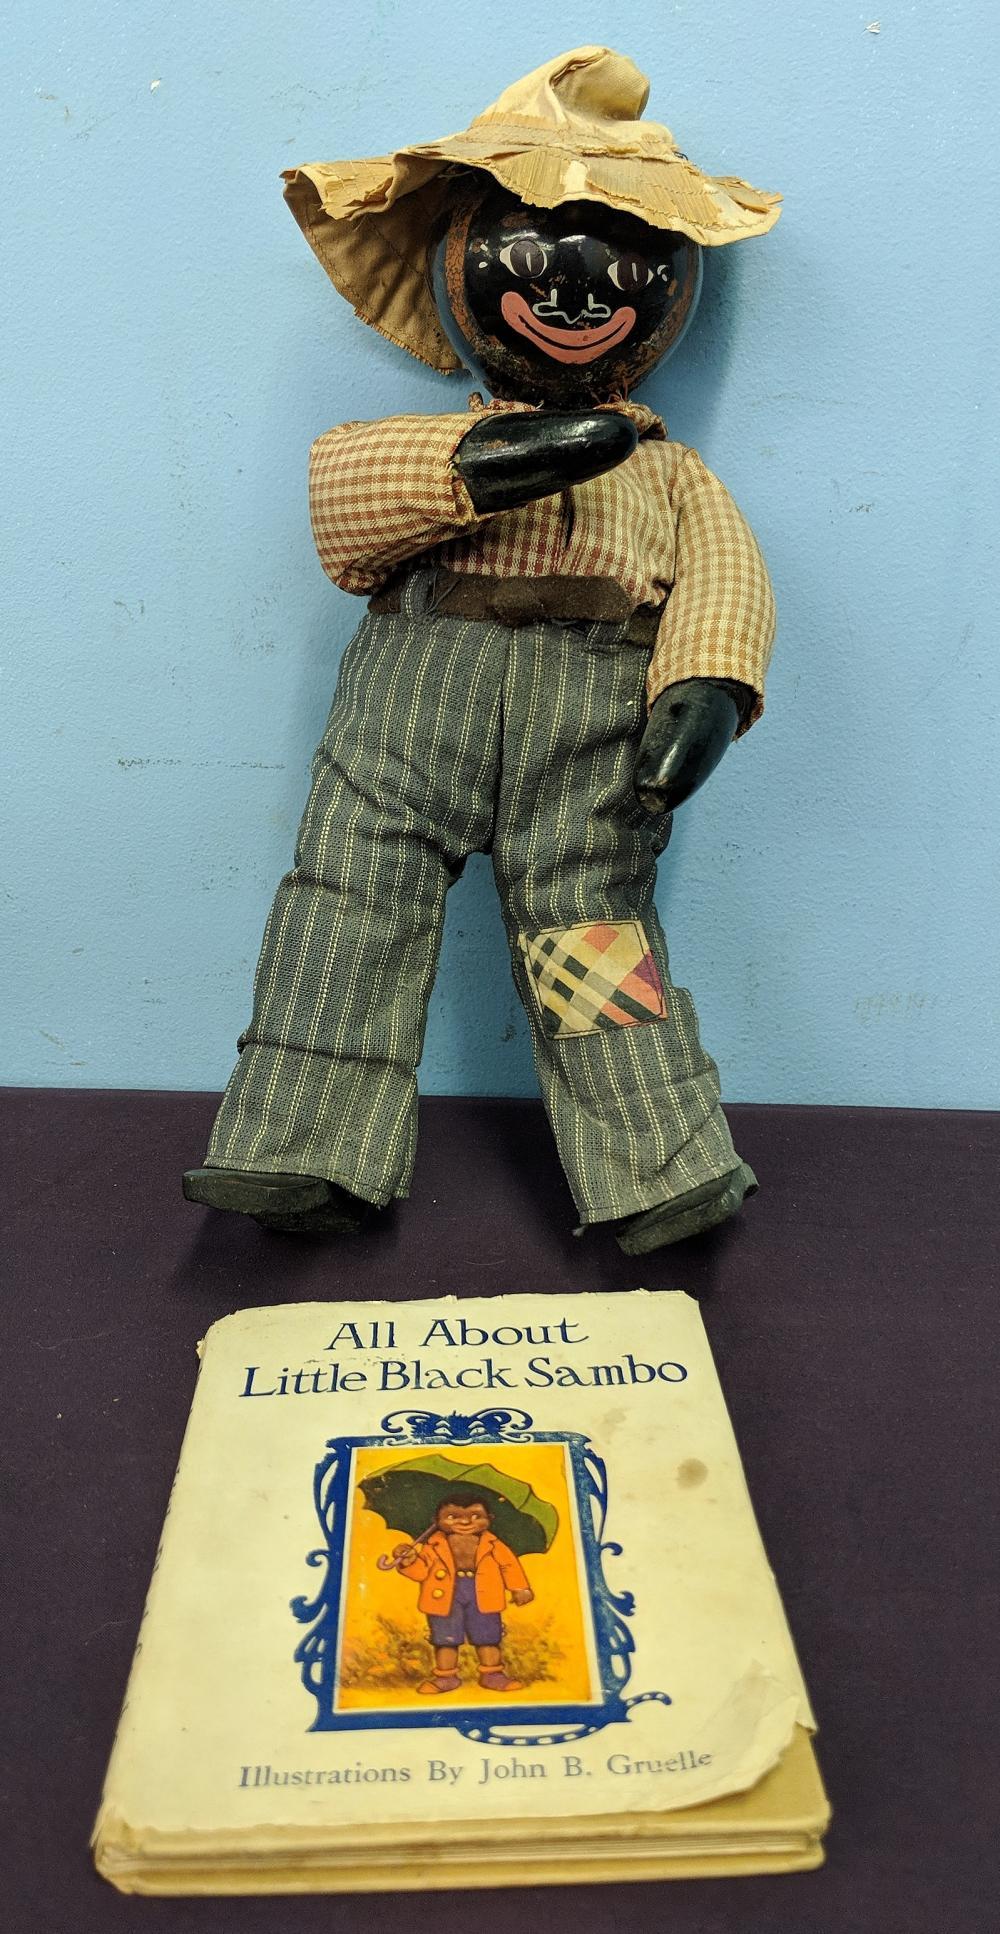 1917 Little Black Sambo Book & Doll